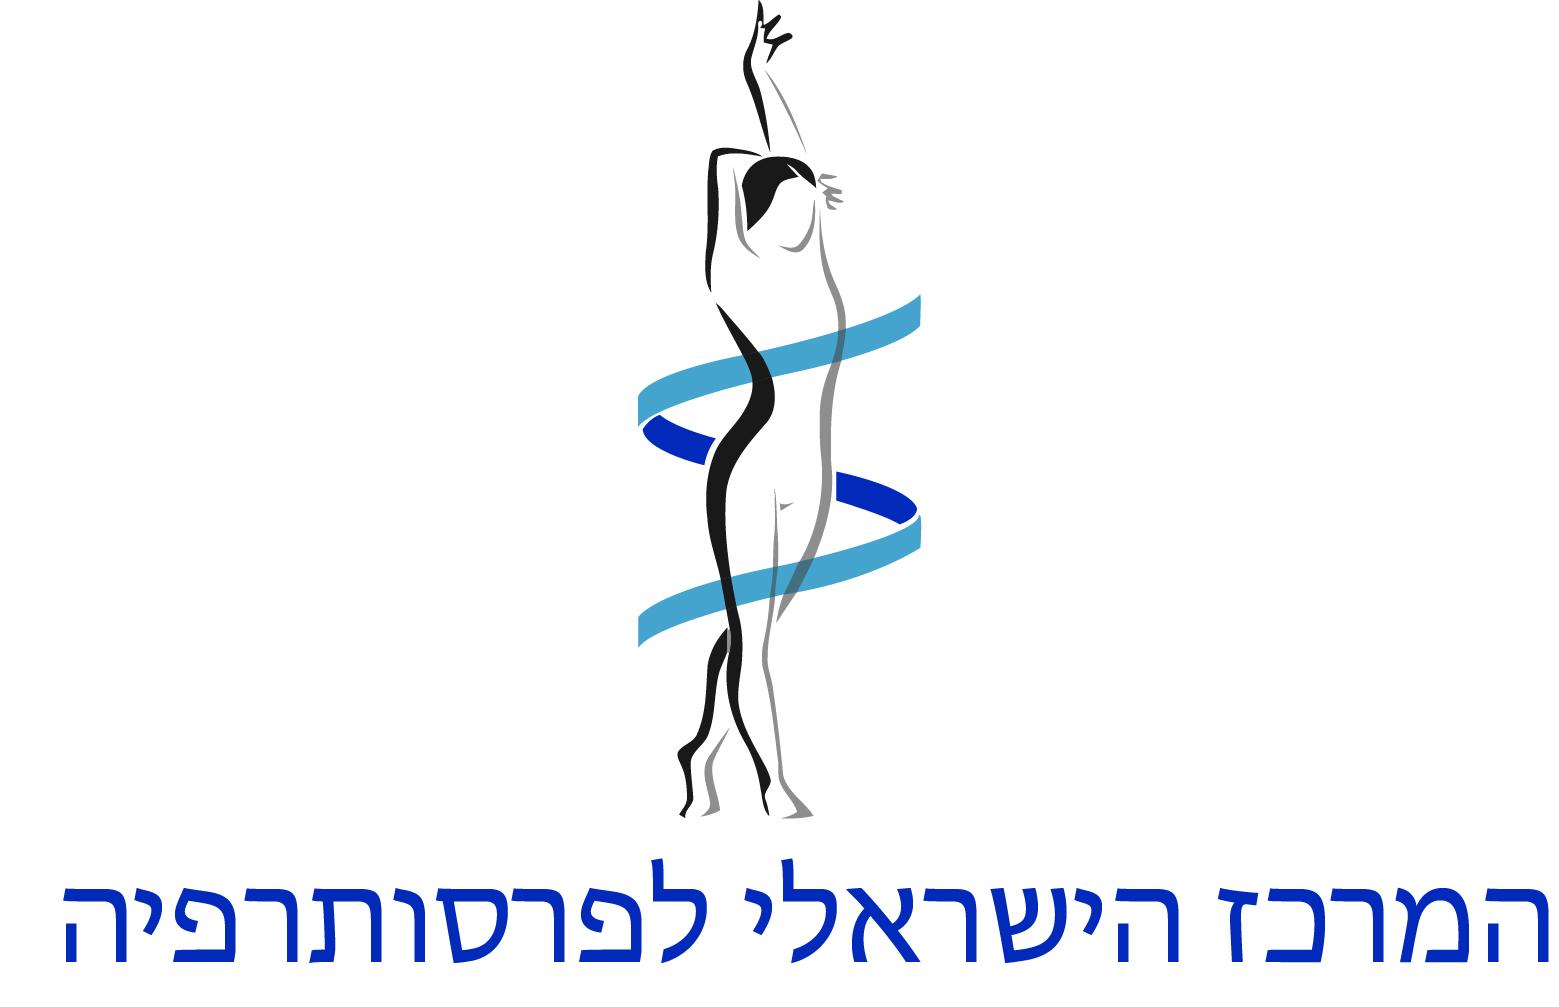 Логотип Израиль